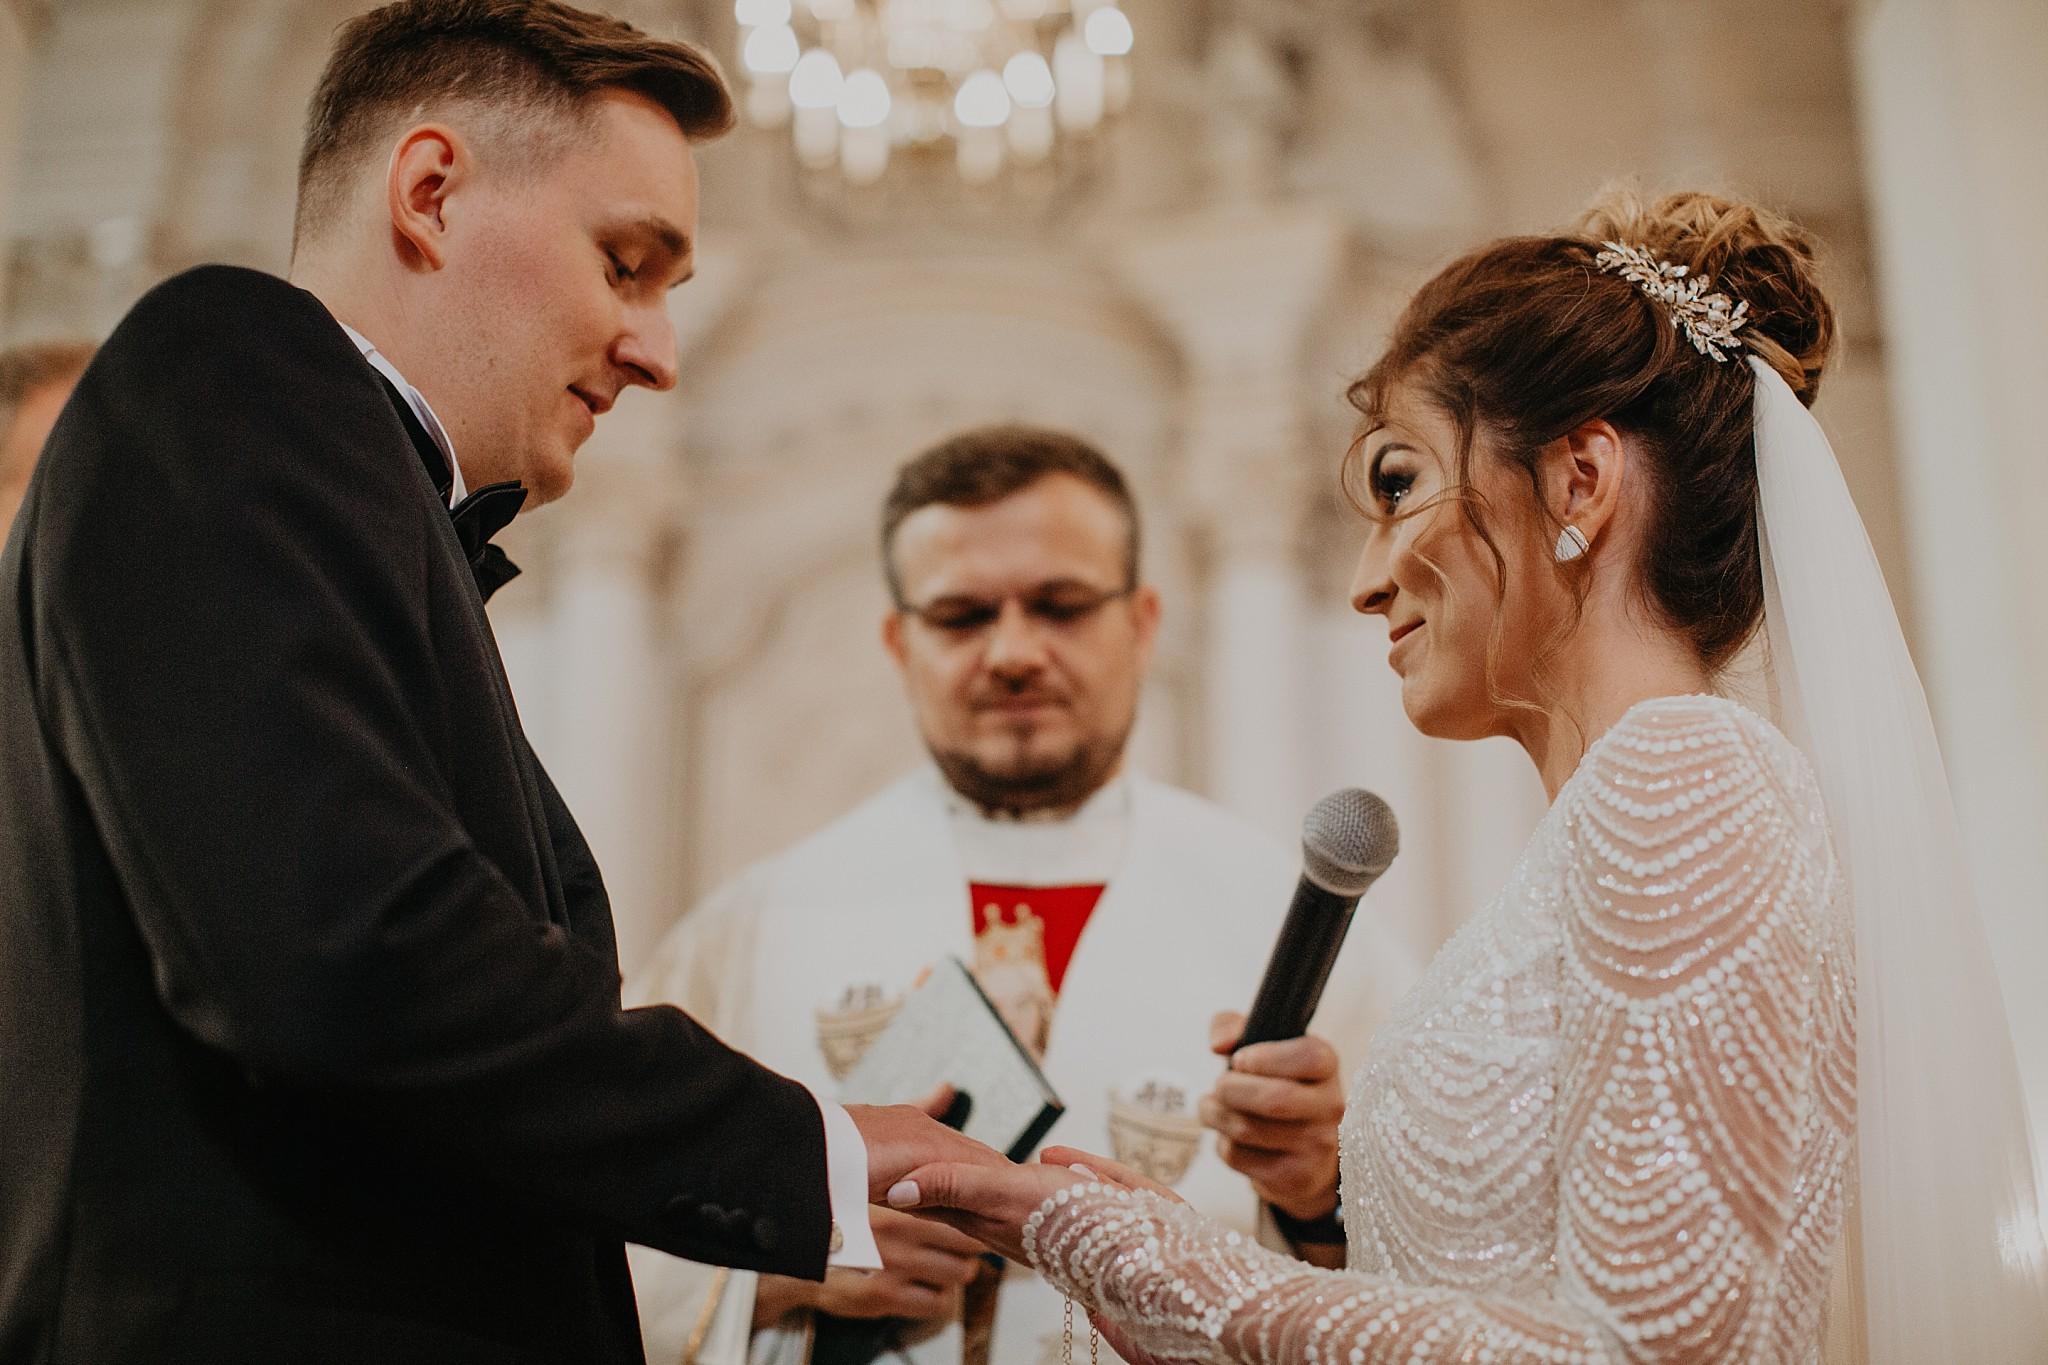 fotograf poznan wesele dobra truskawka piekne wesele pod poznaniem wesele w dobrej truskawce piekna para mloda slub marzen slub koronawirus slub listopad wesele koronawirus 178